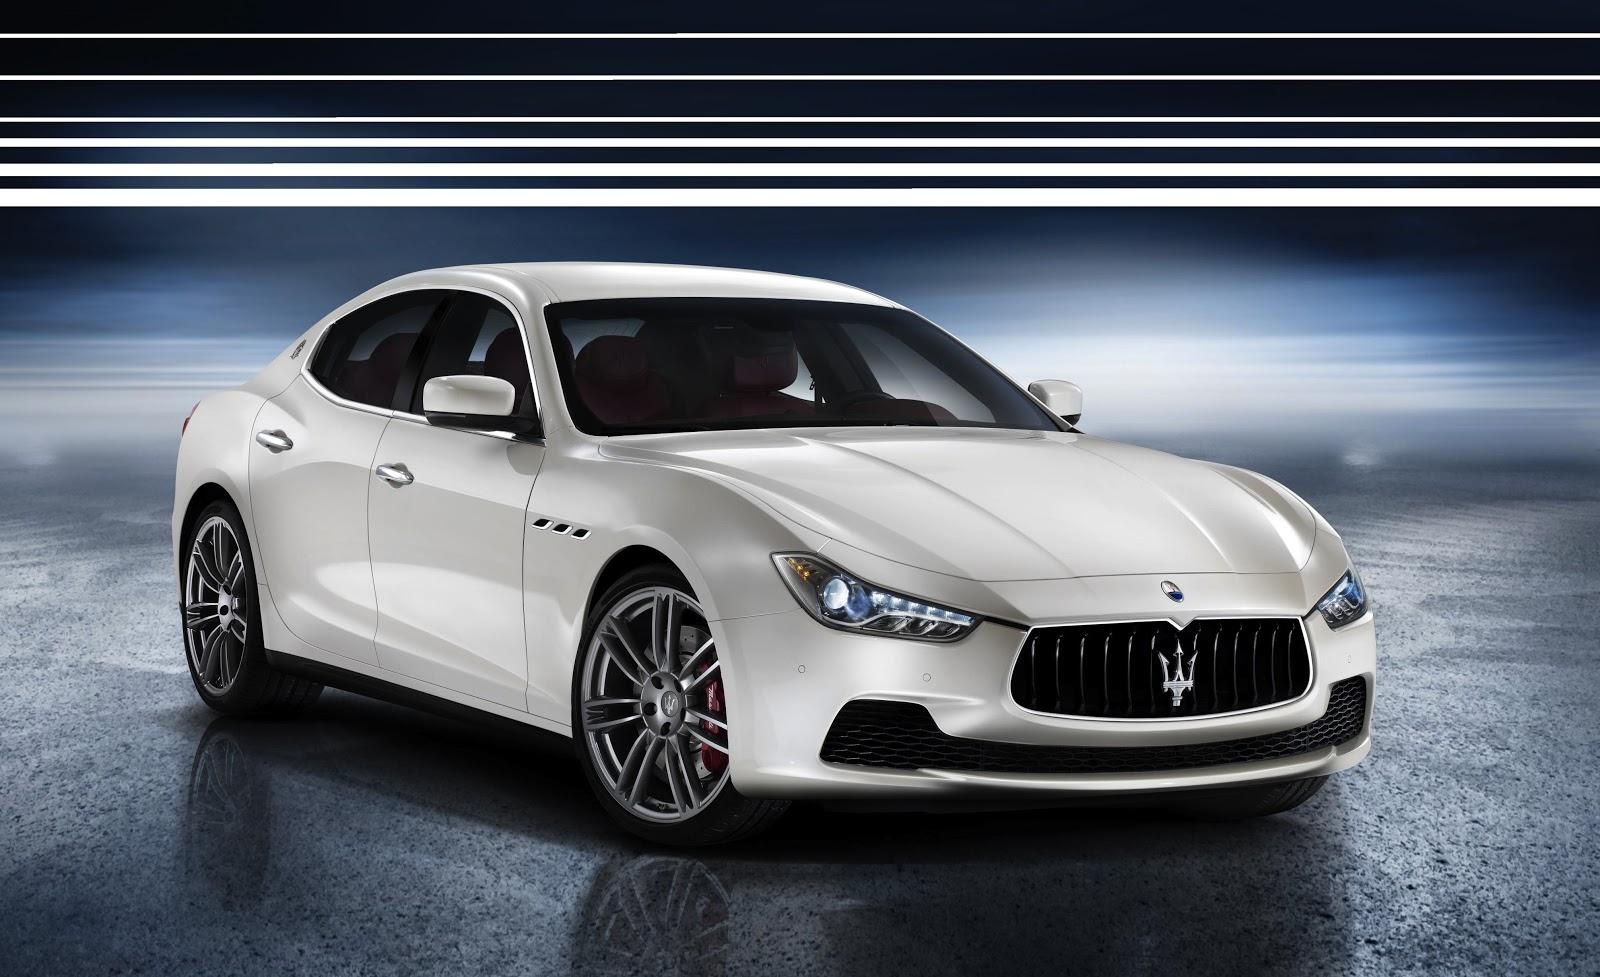 Speedmonkey: 2013 Maserati Ghibli revealed - and its a beauty